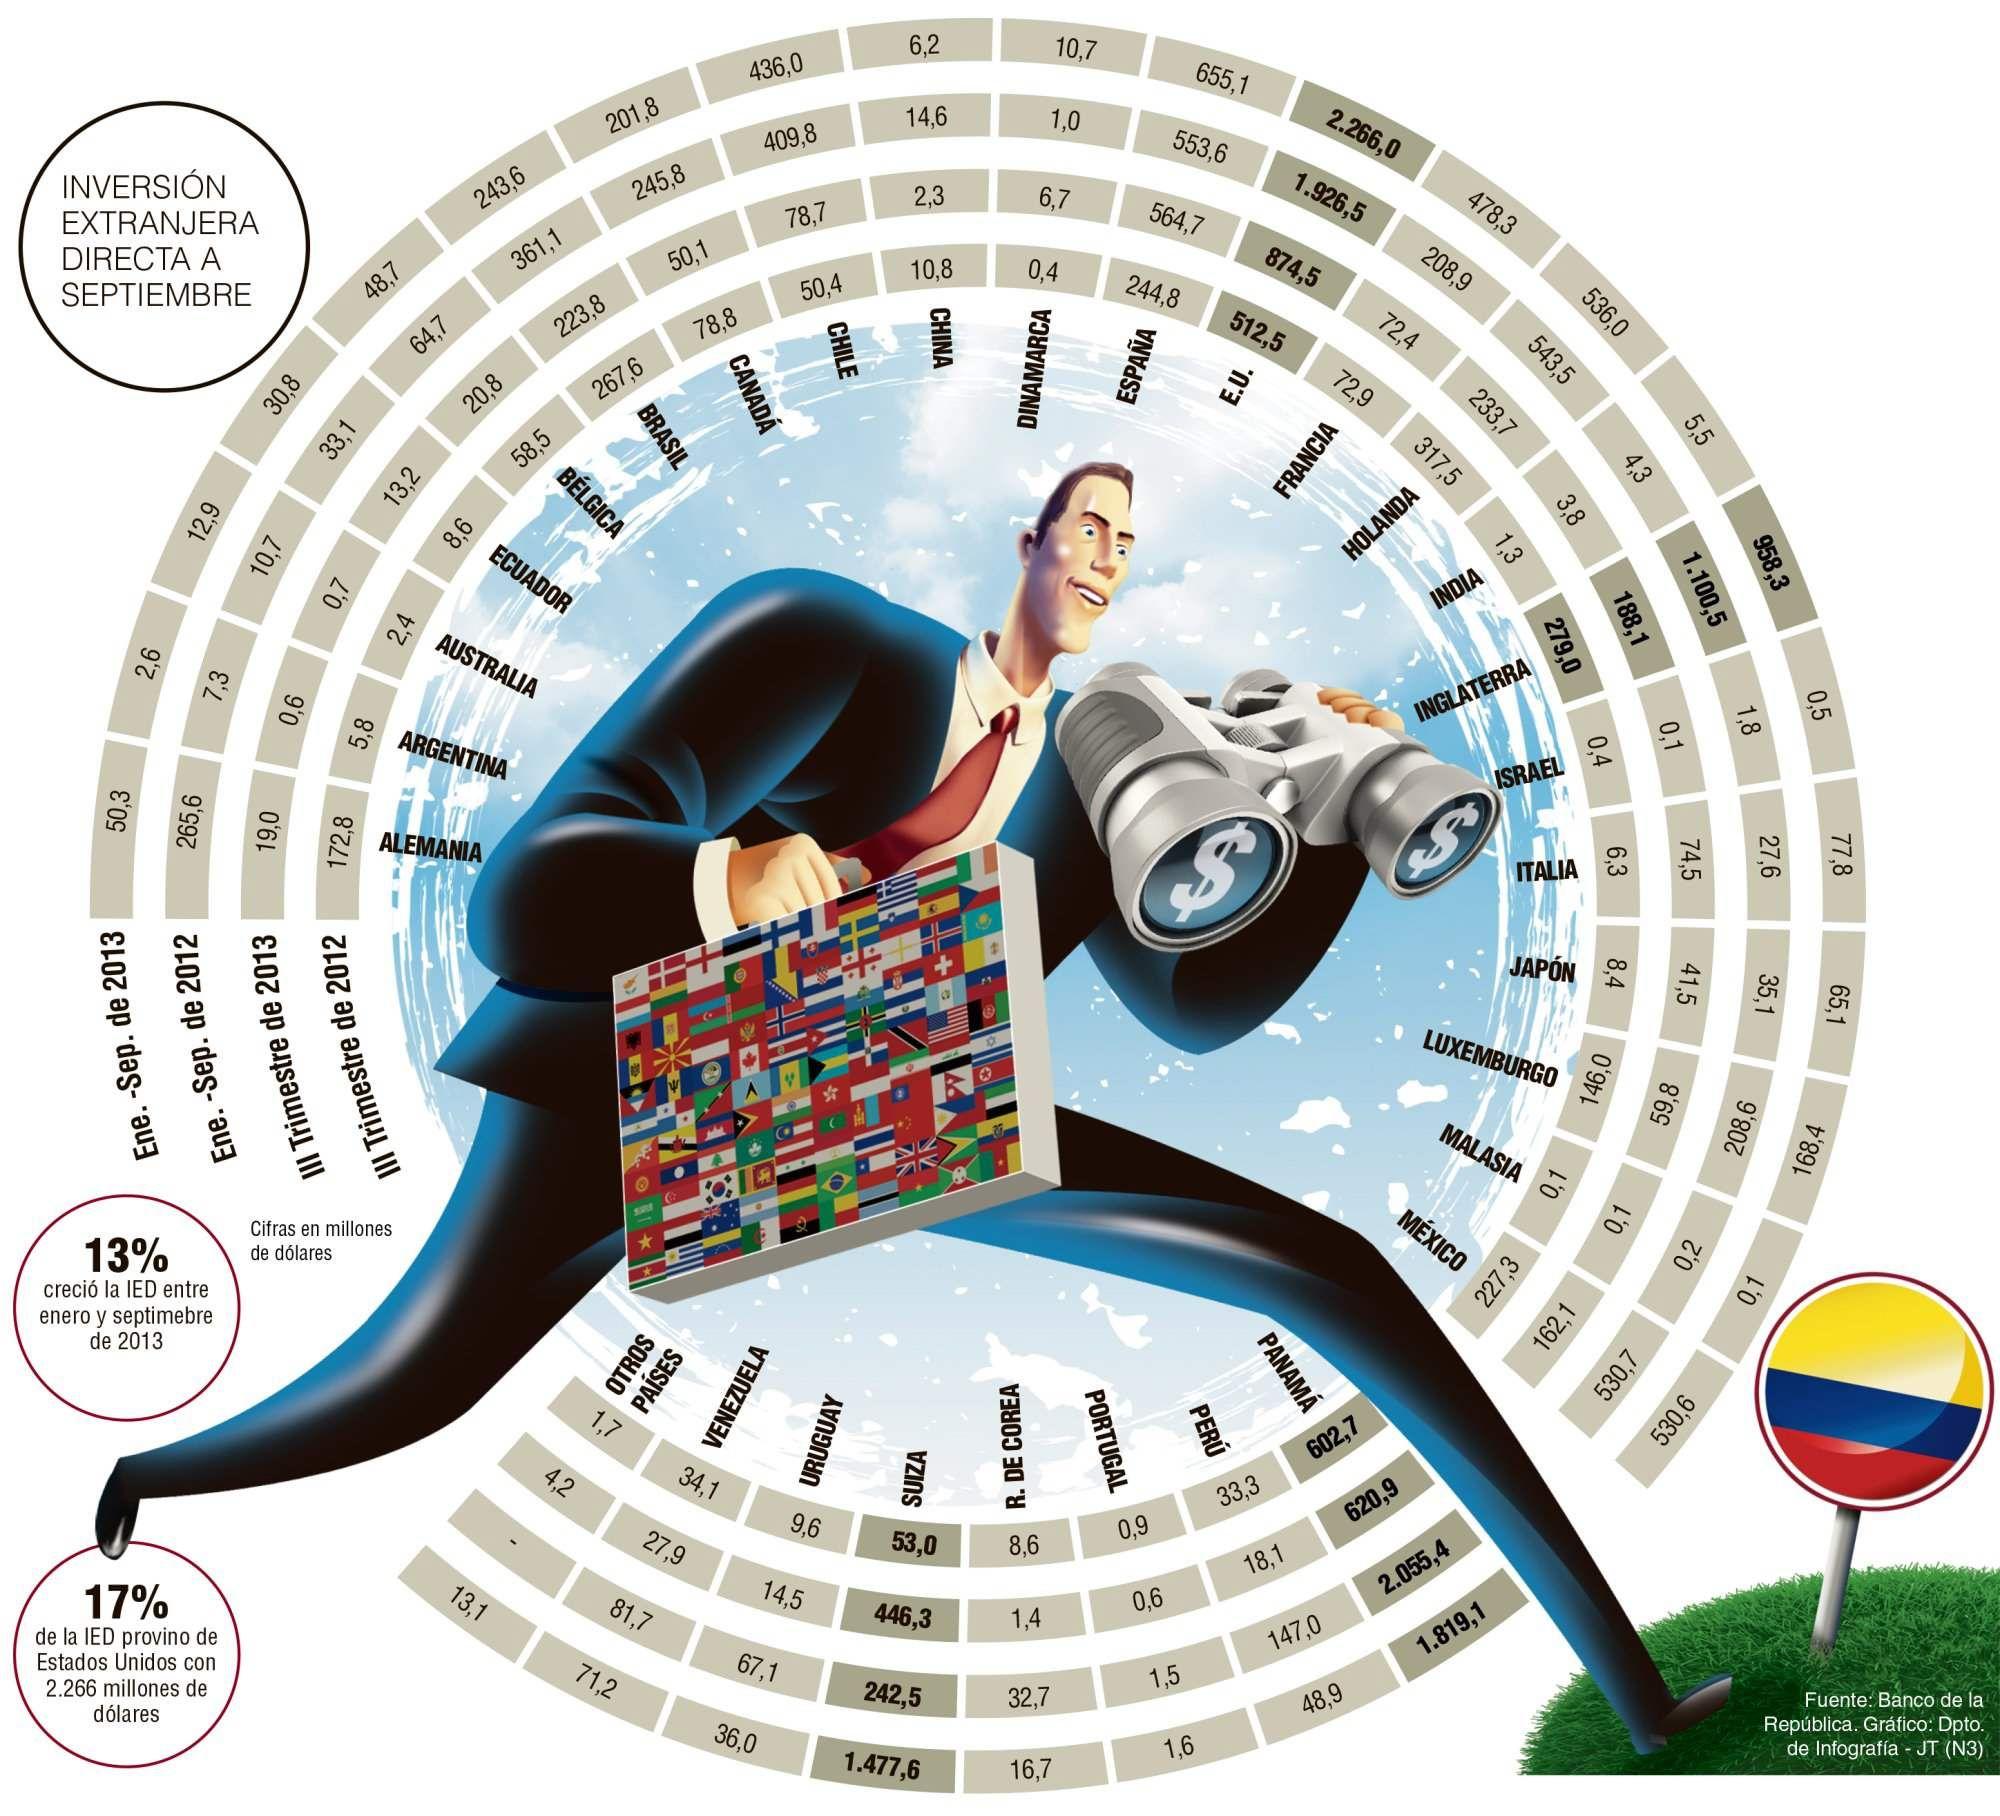 Inversión Extranjera Directa a Septiembre 2013 #Negocios